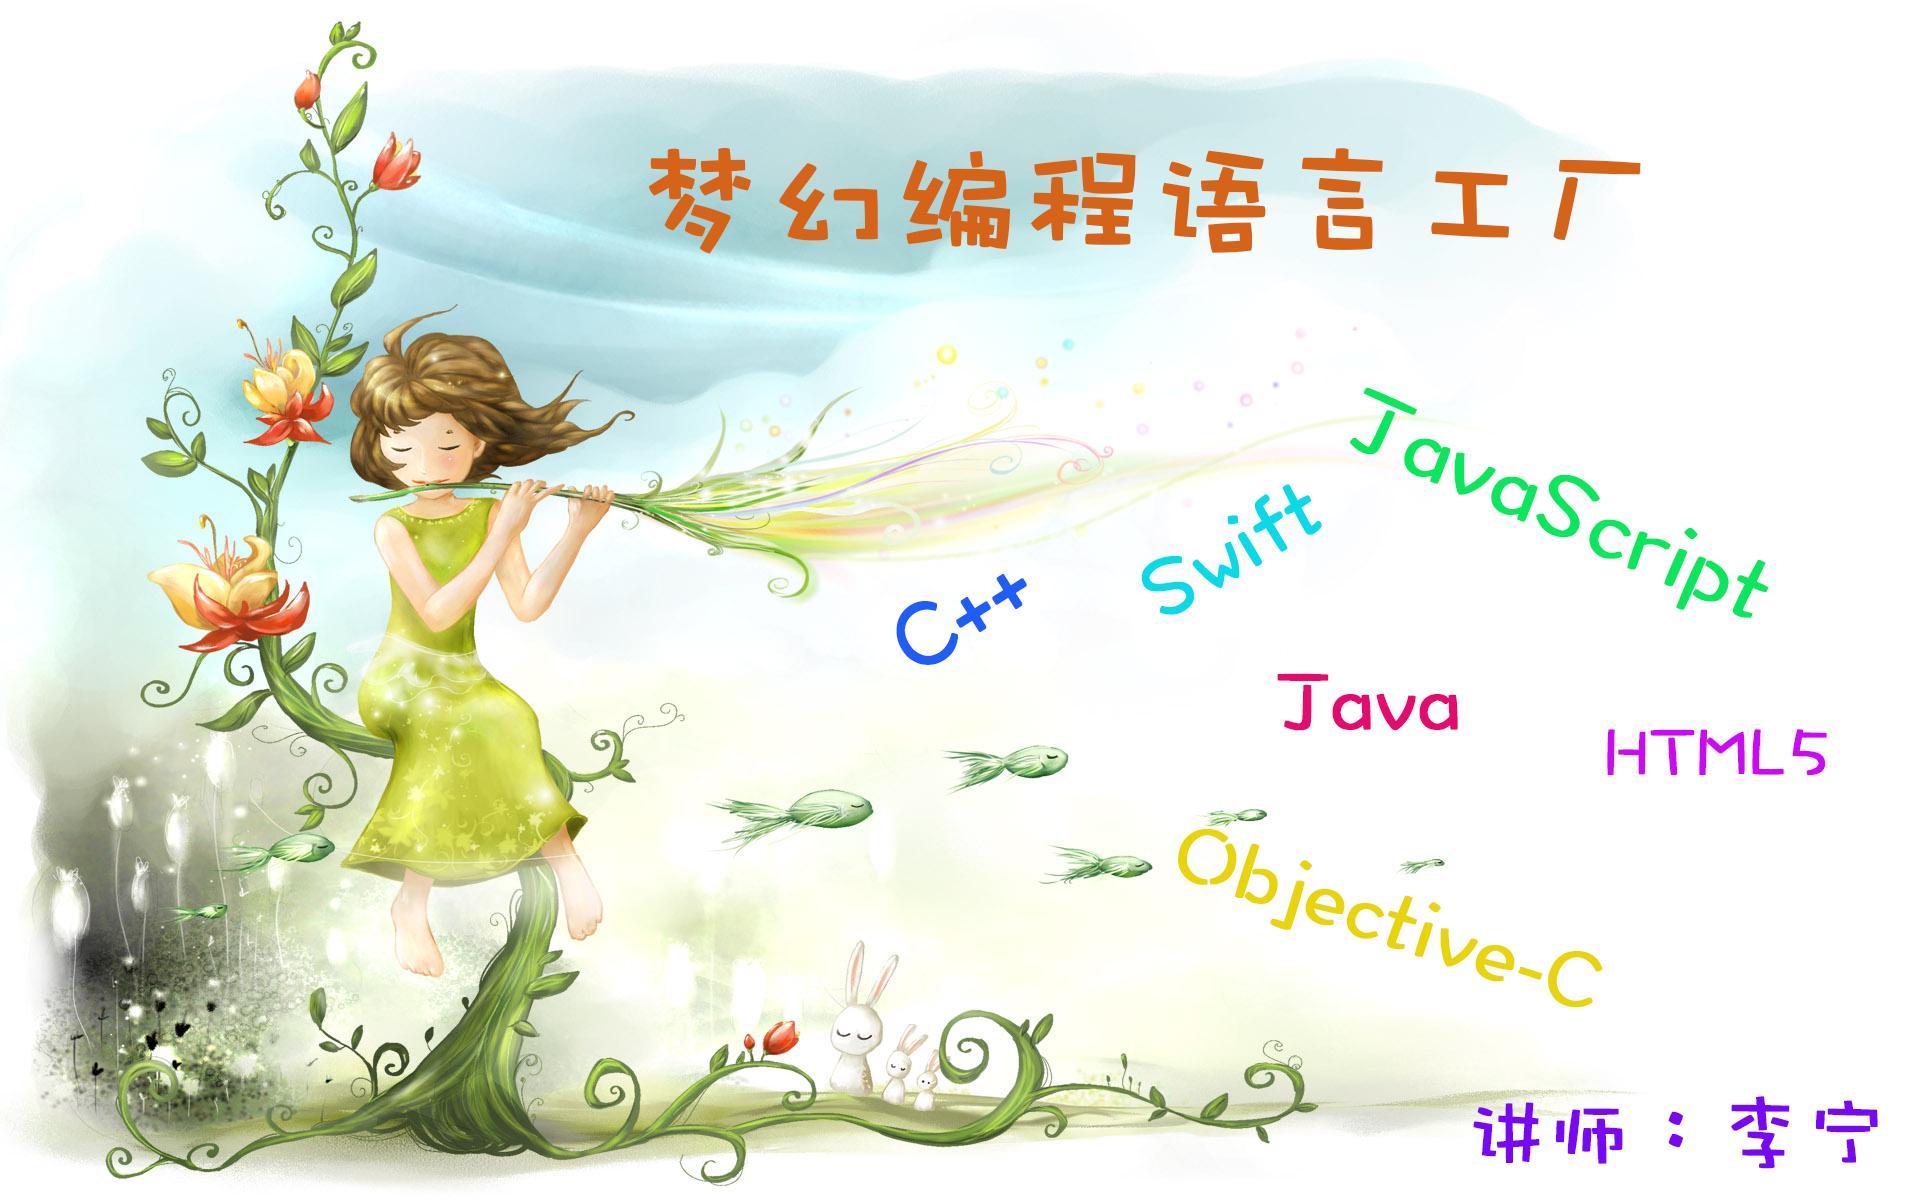 梦幻编程语言工厂系列套餐(C++/Java/Android/JavaScript/Objective-C)